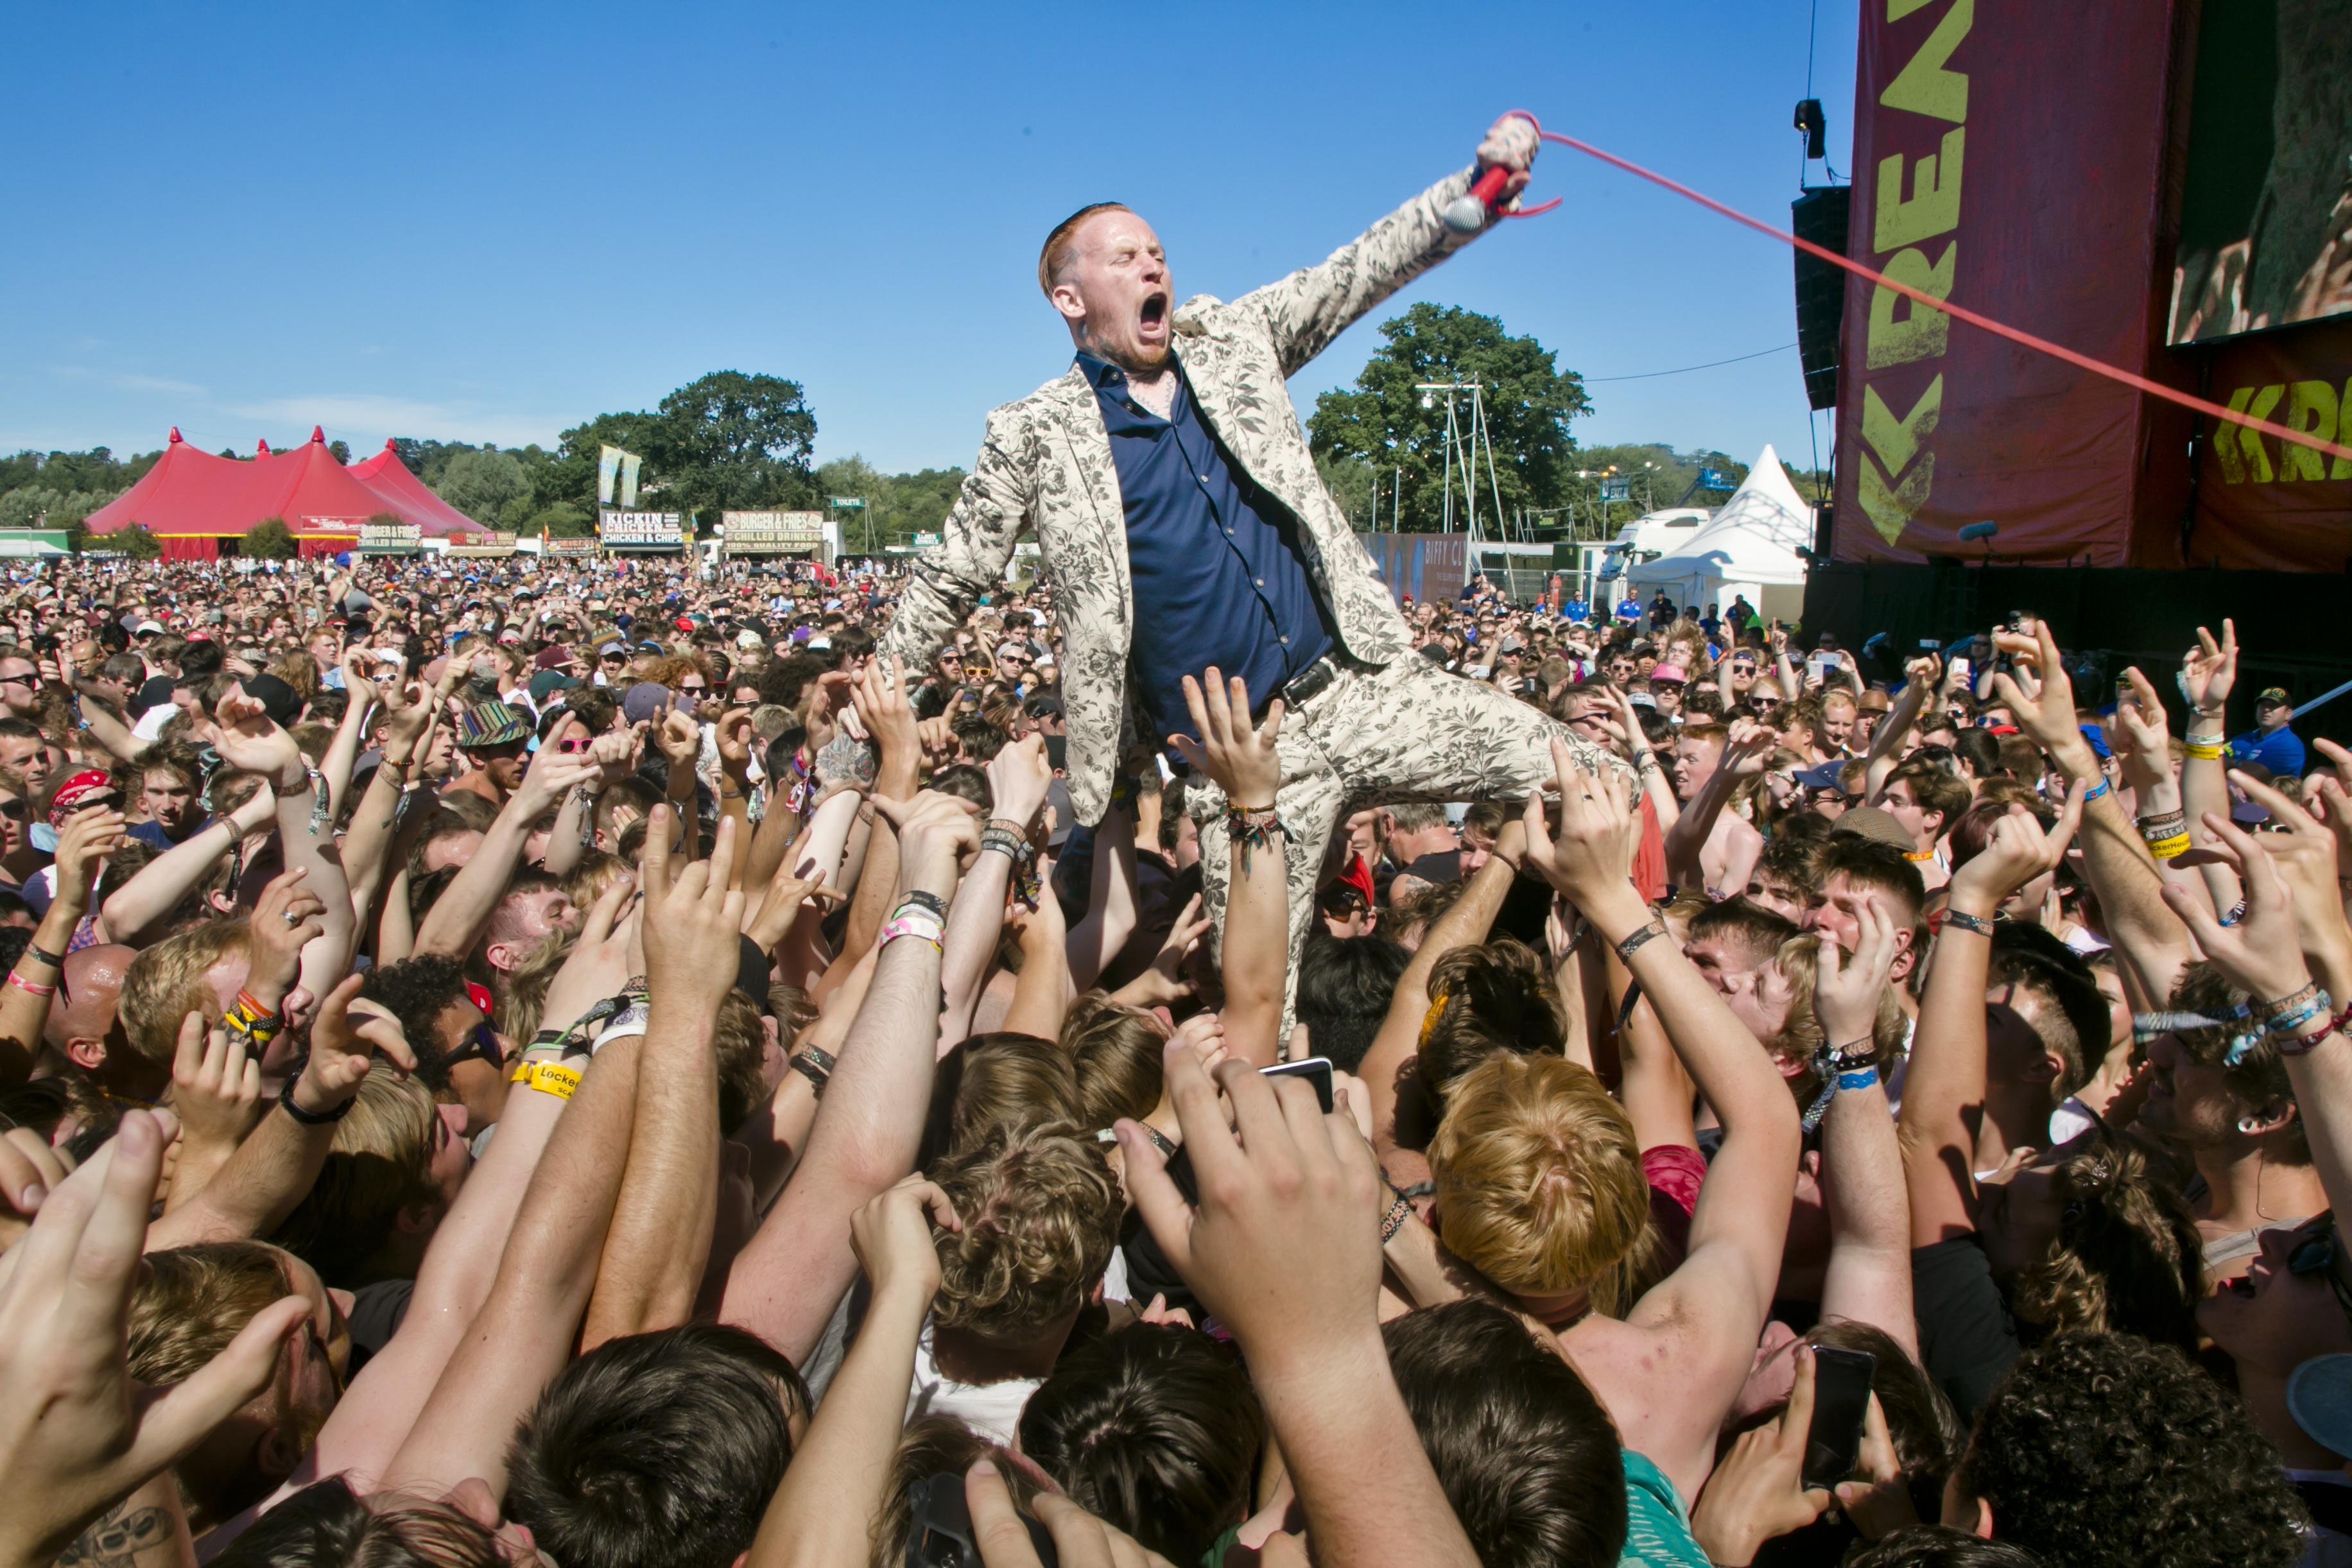 Frank_Carter_Reading_Festival_UK_Matias_Altbach